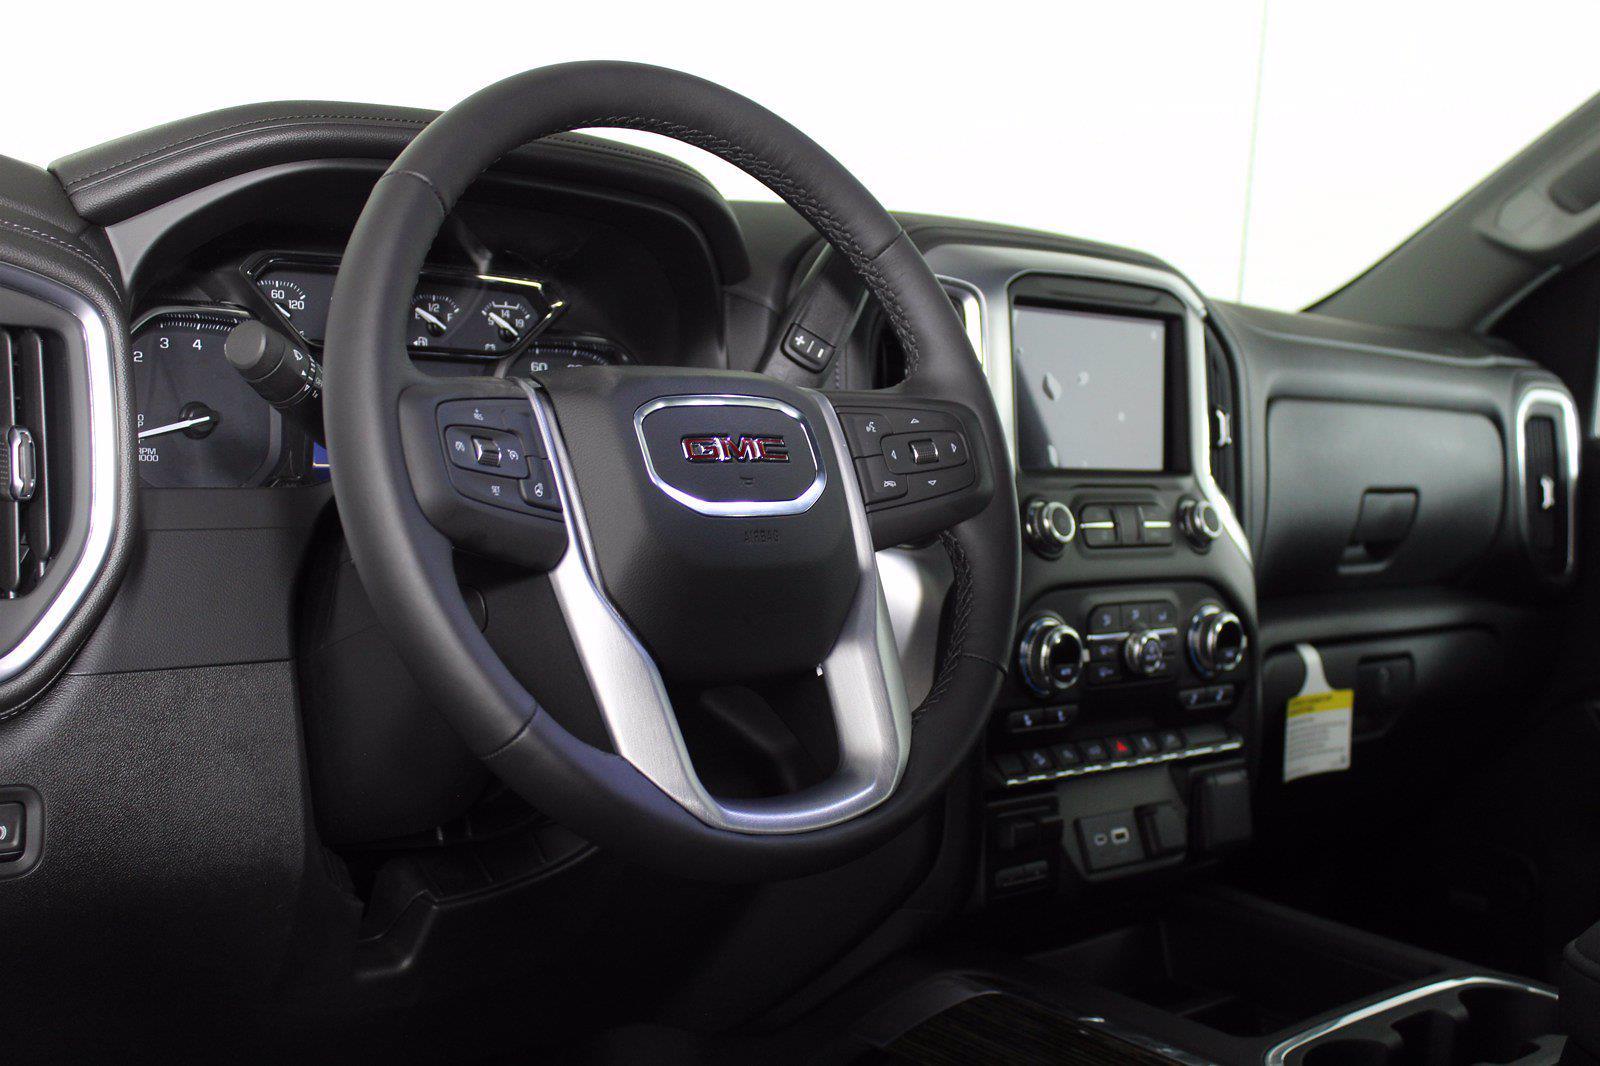 2021 GMC Sierra 1500 Crew Cab 4x4, Pickup #D411004 - photo 10